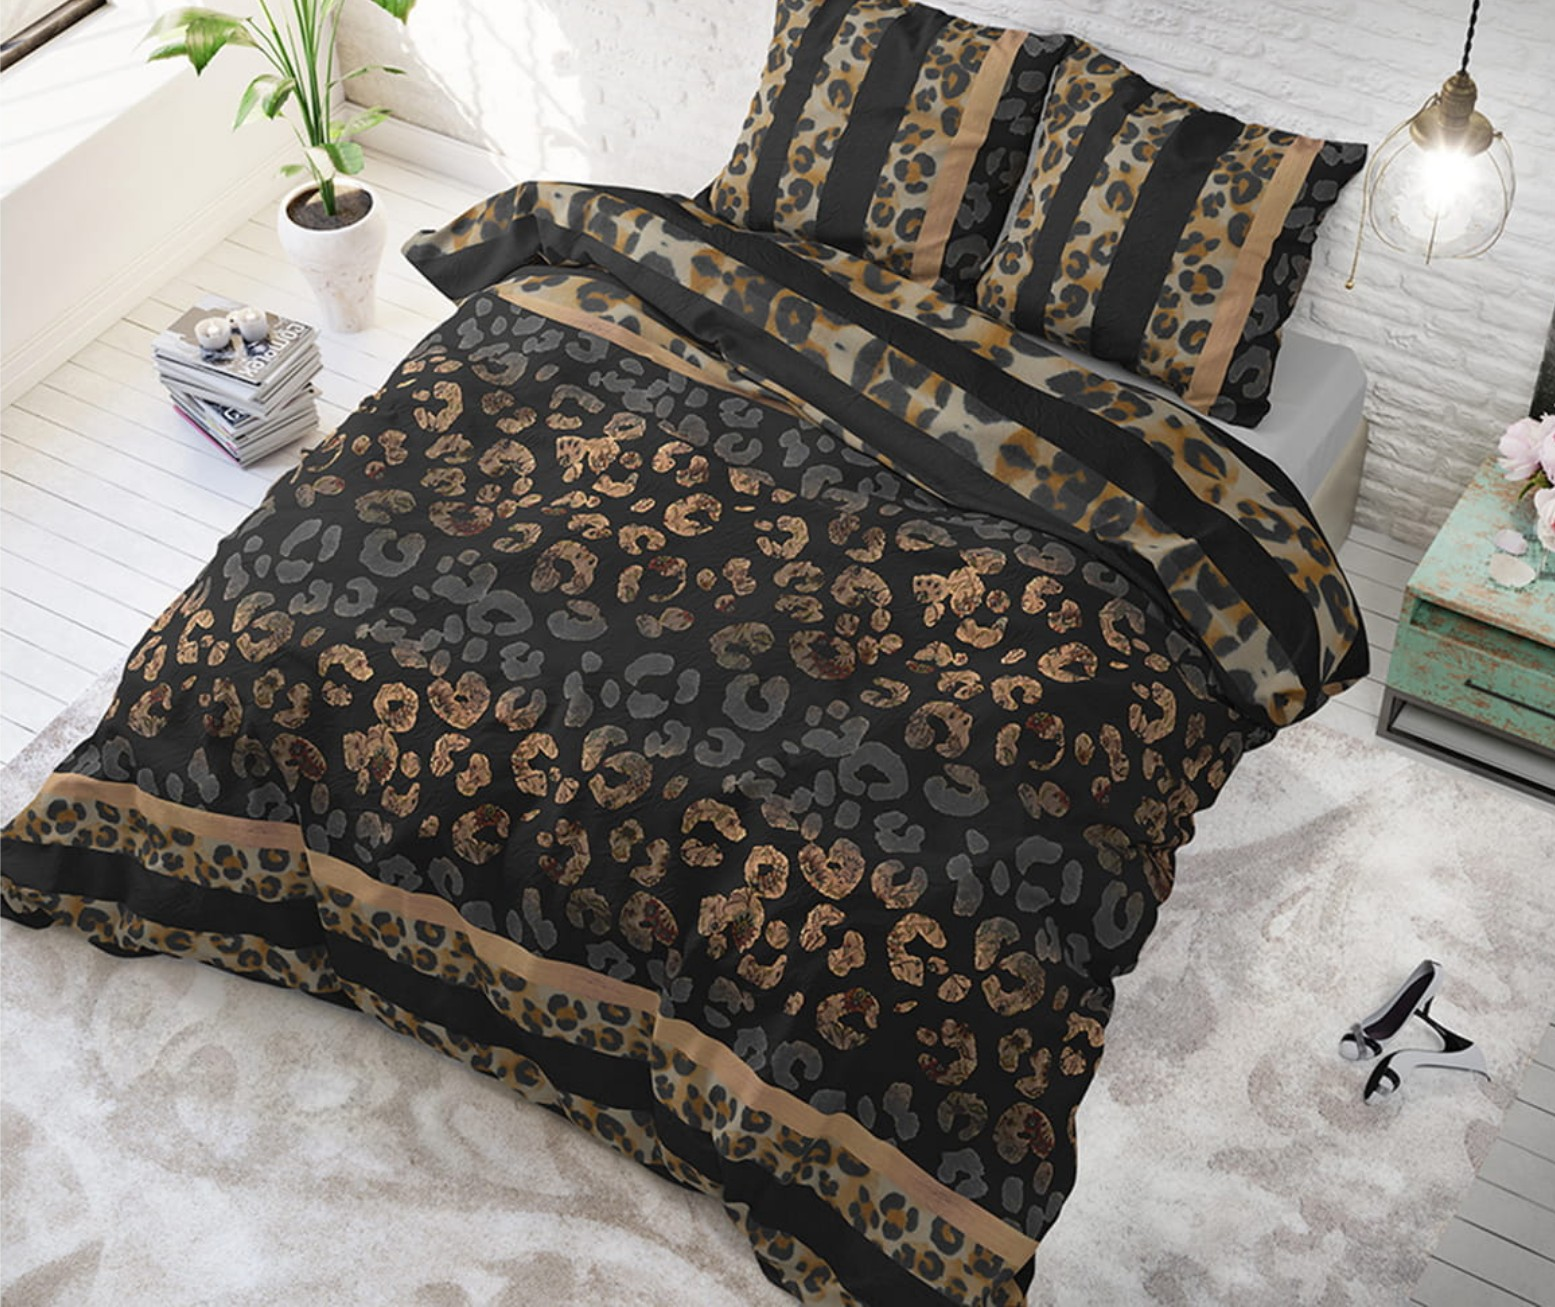 DomTextilu Originálne posteľné obliečky PANTHER 140 x 200 cm 21136